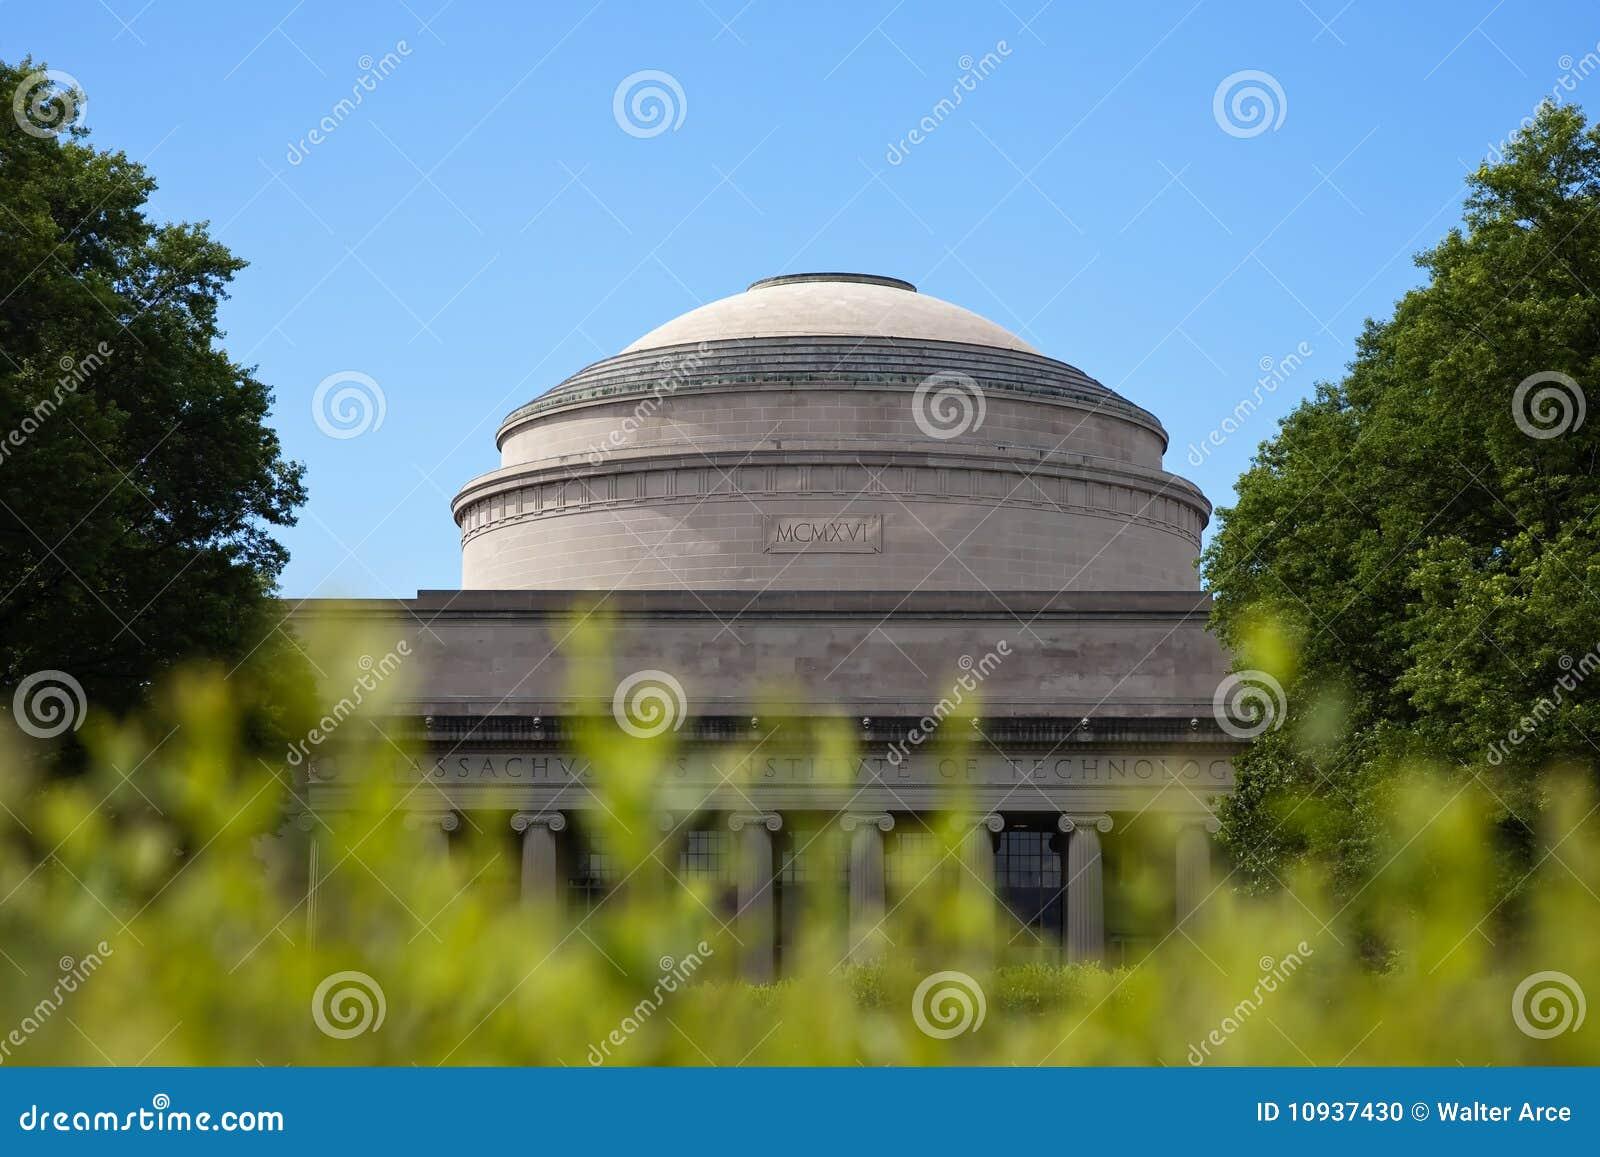 технология massachusetts института